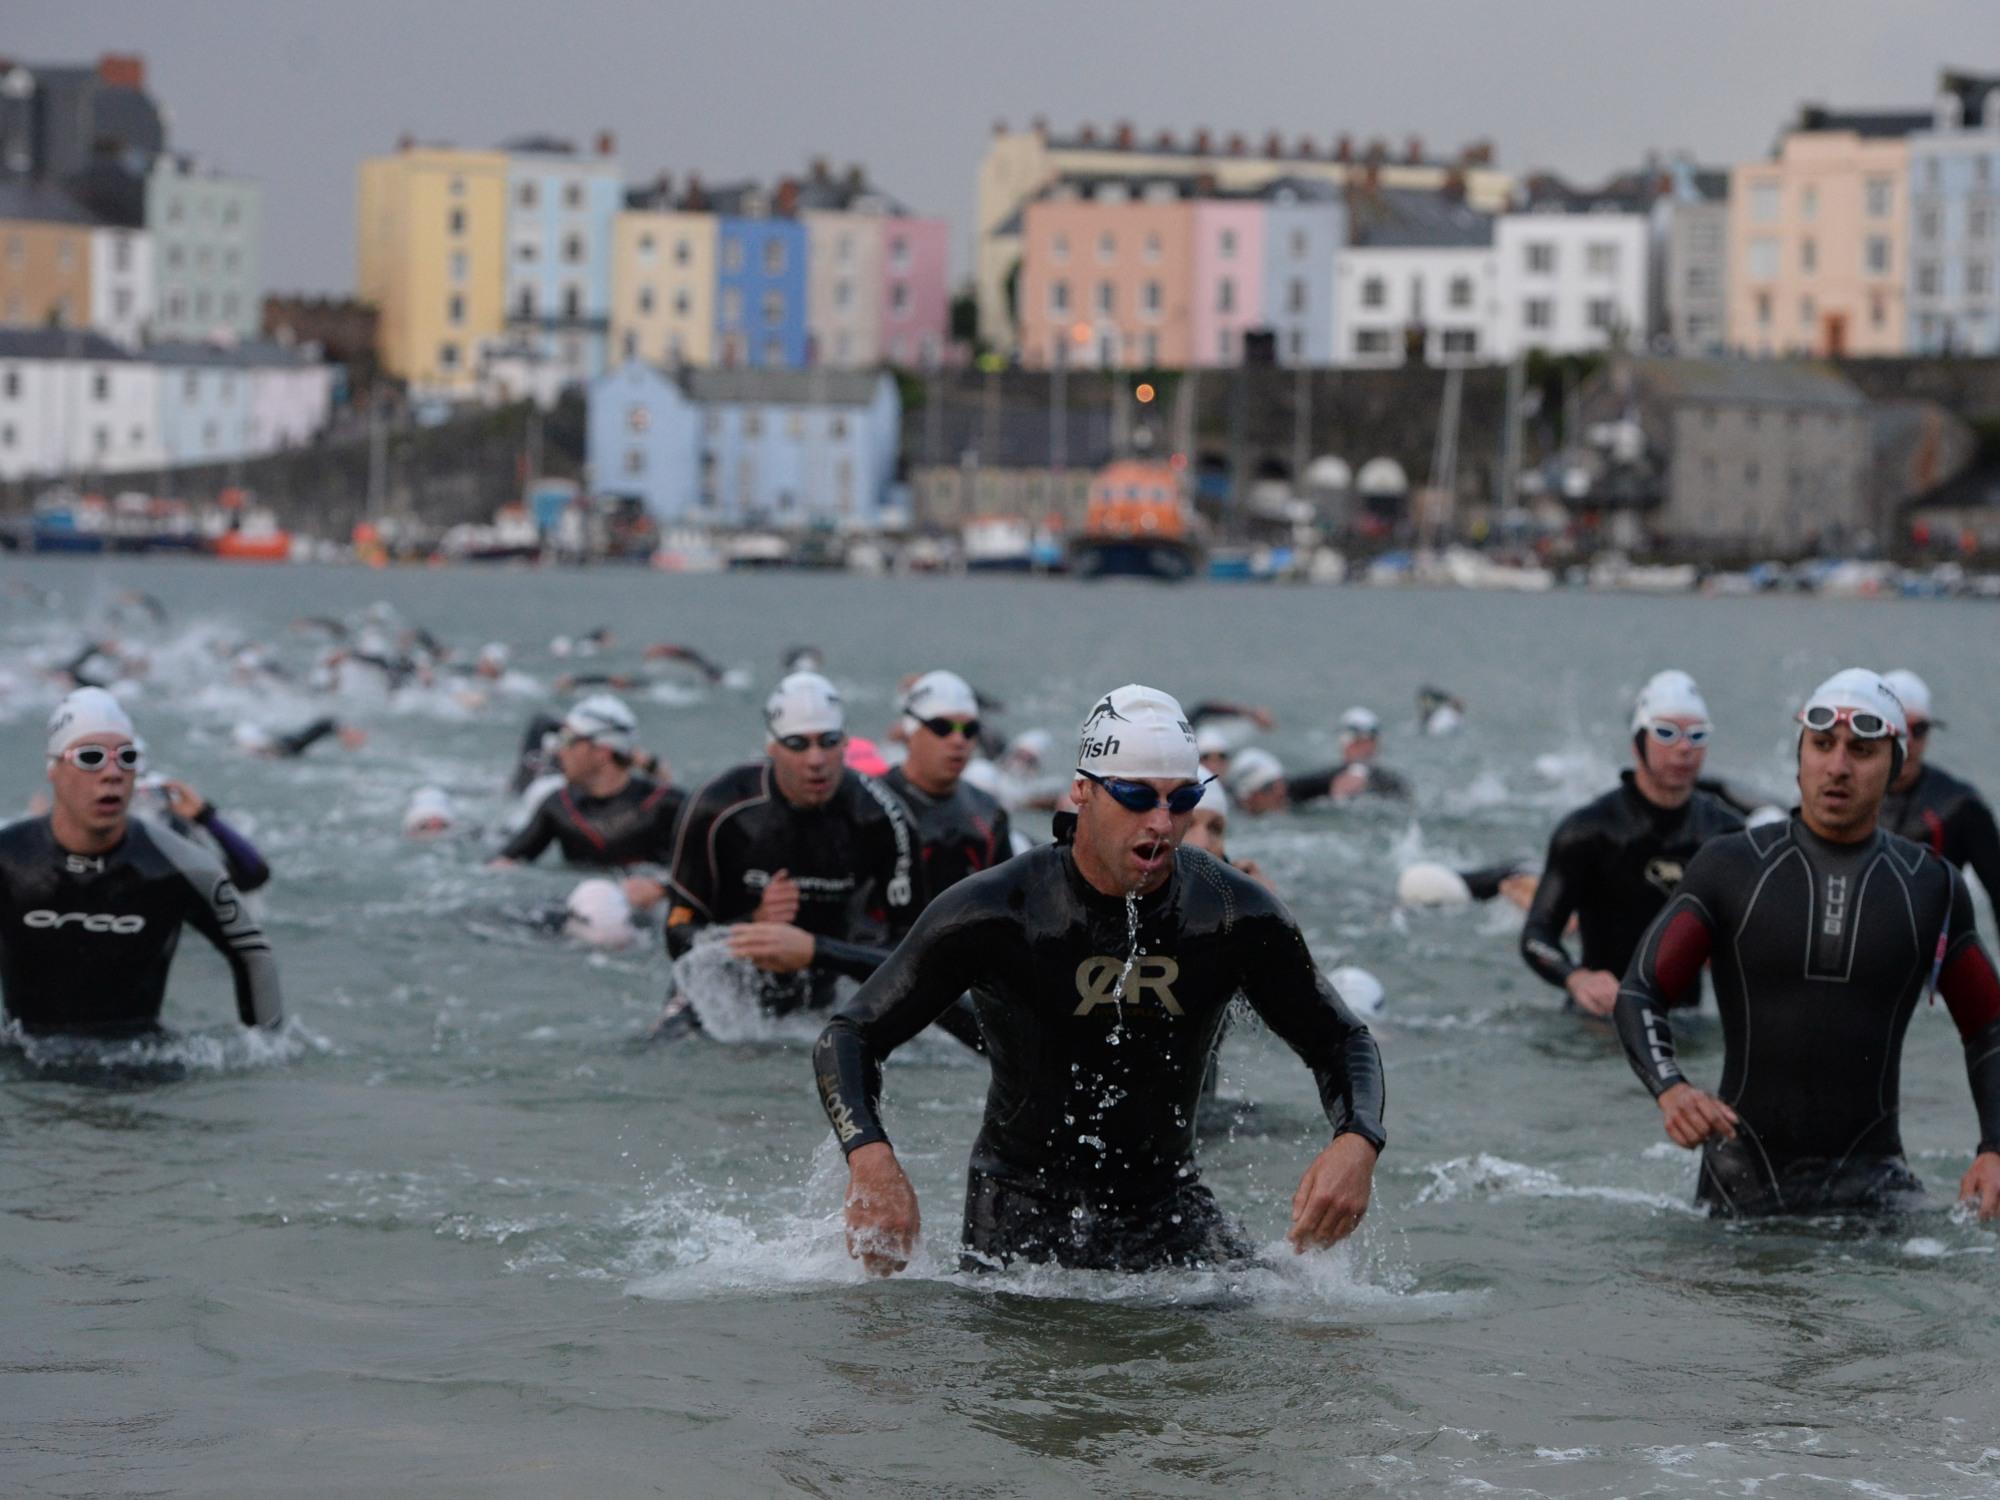 ironman wales 2014, ironman wales review, ironman wales triathlon tips, triathlon review, iornman tenby